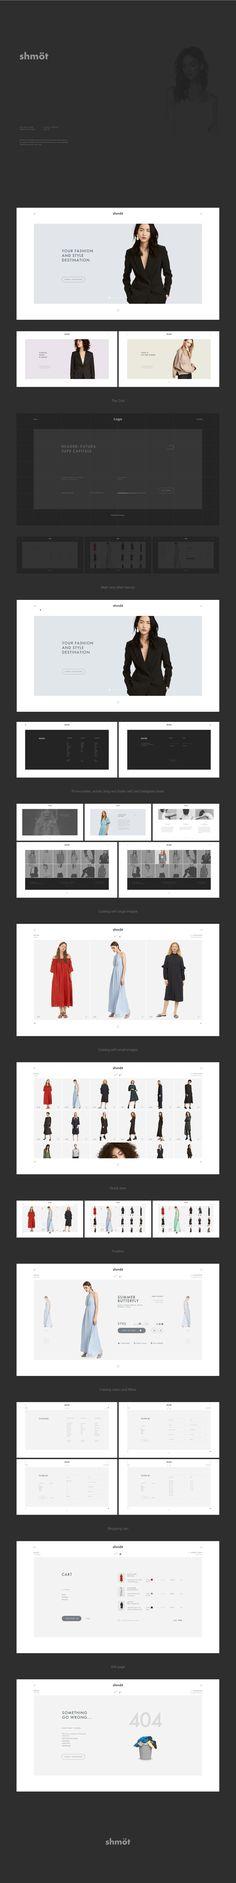 Great minimalist web design by Alex Yudin.